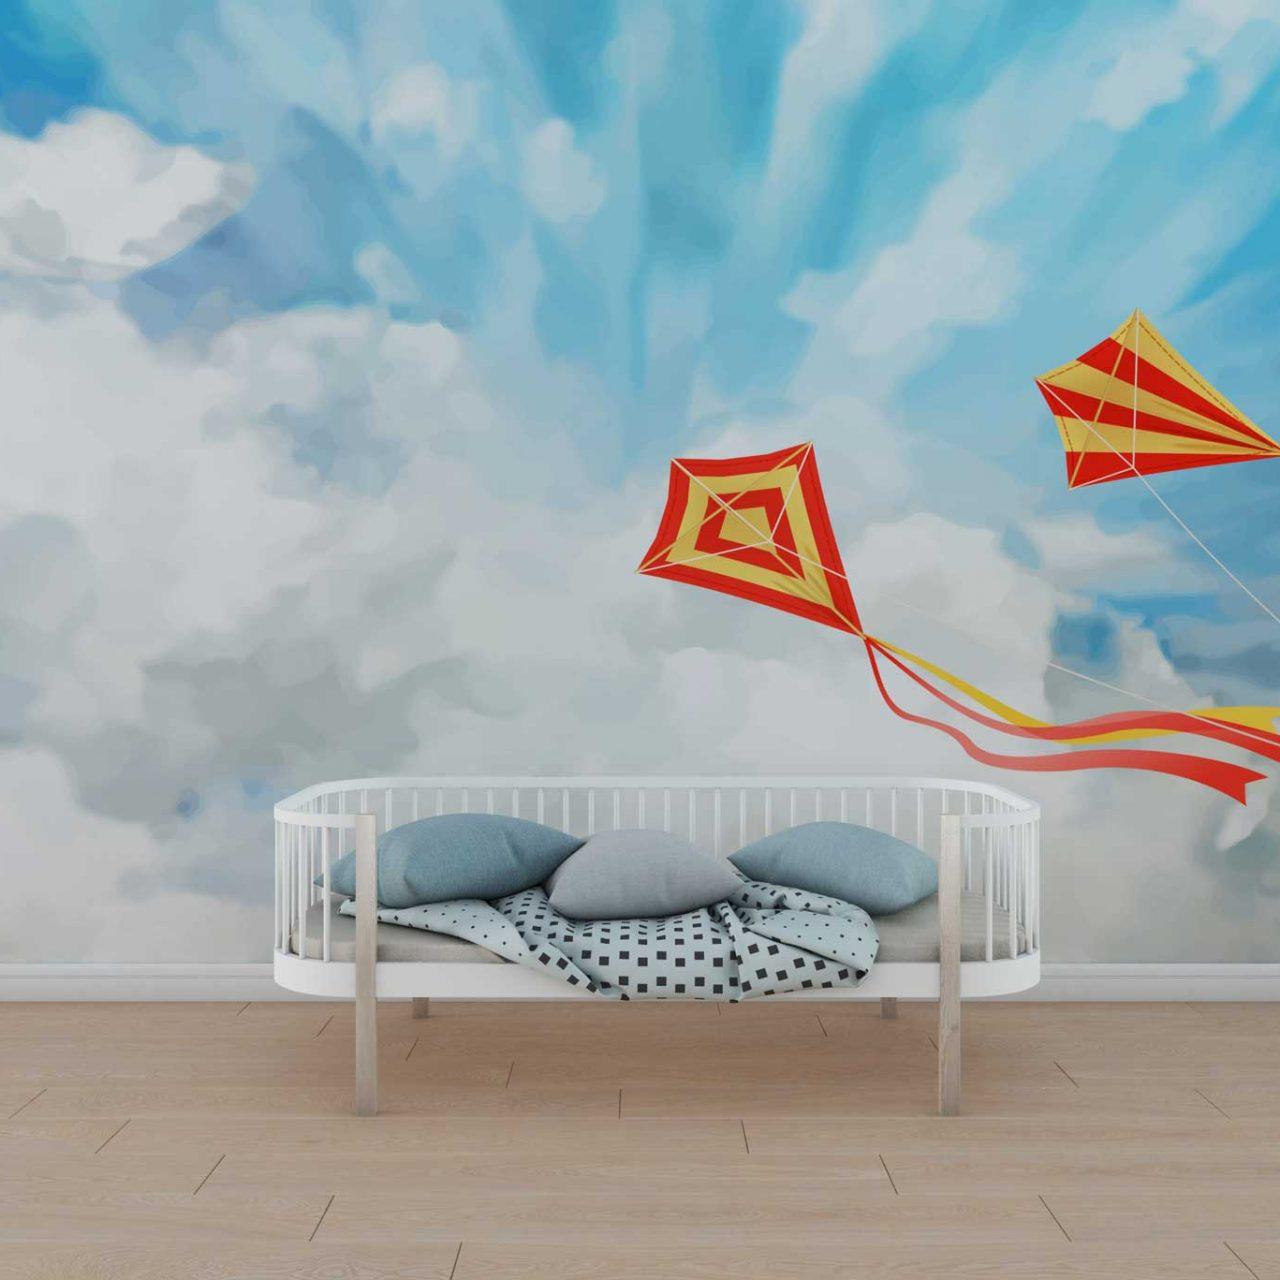 https://daringprints.ro/wp-content/uploads/2020/12/tapet-fototapet-design-personalizat-customizabil-comanda-special-camera-dormitor-copii-model-cer-senin-zmeie-rosu-galben-nori-albi-desen-pictura-1280x1280.jpg